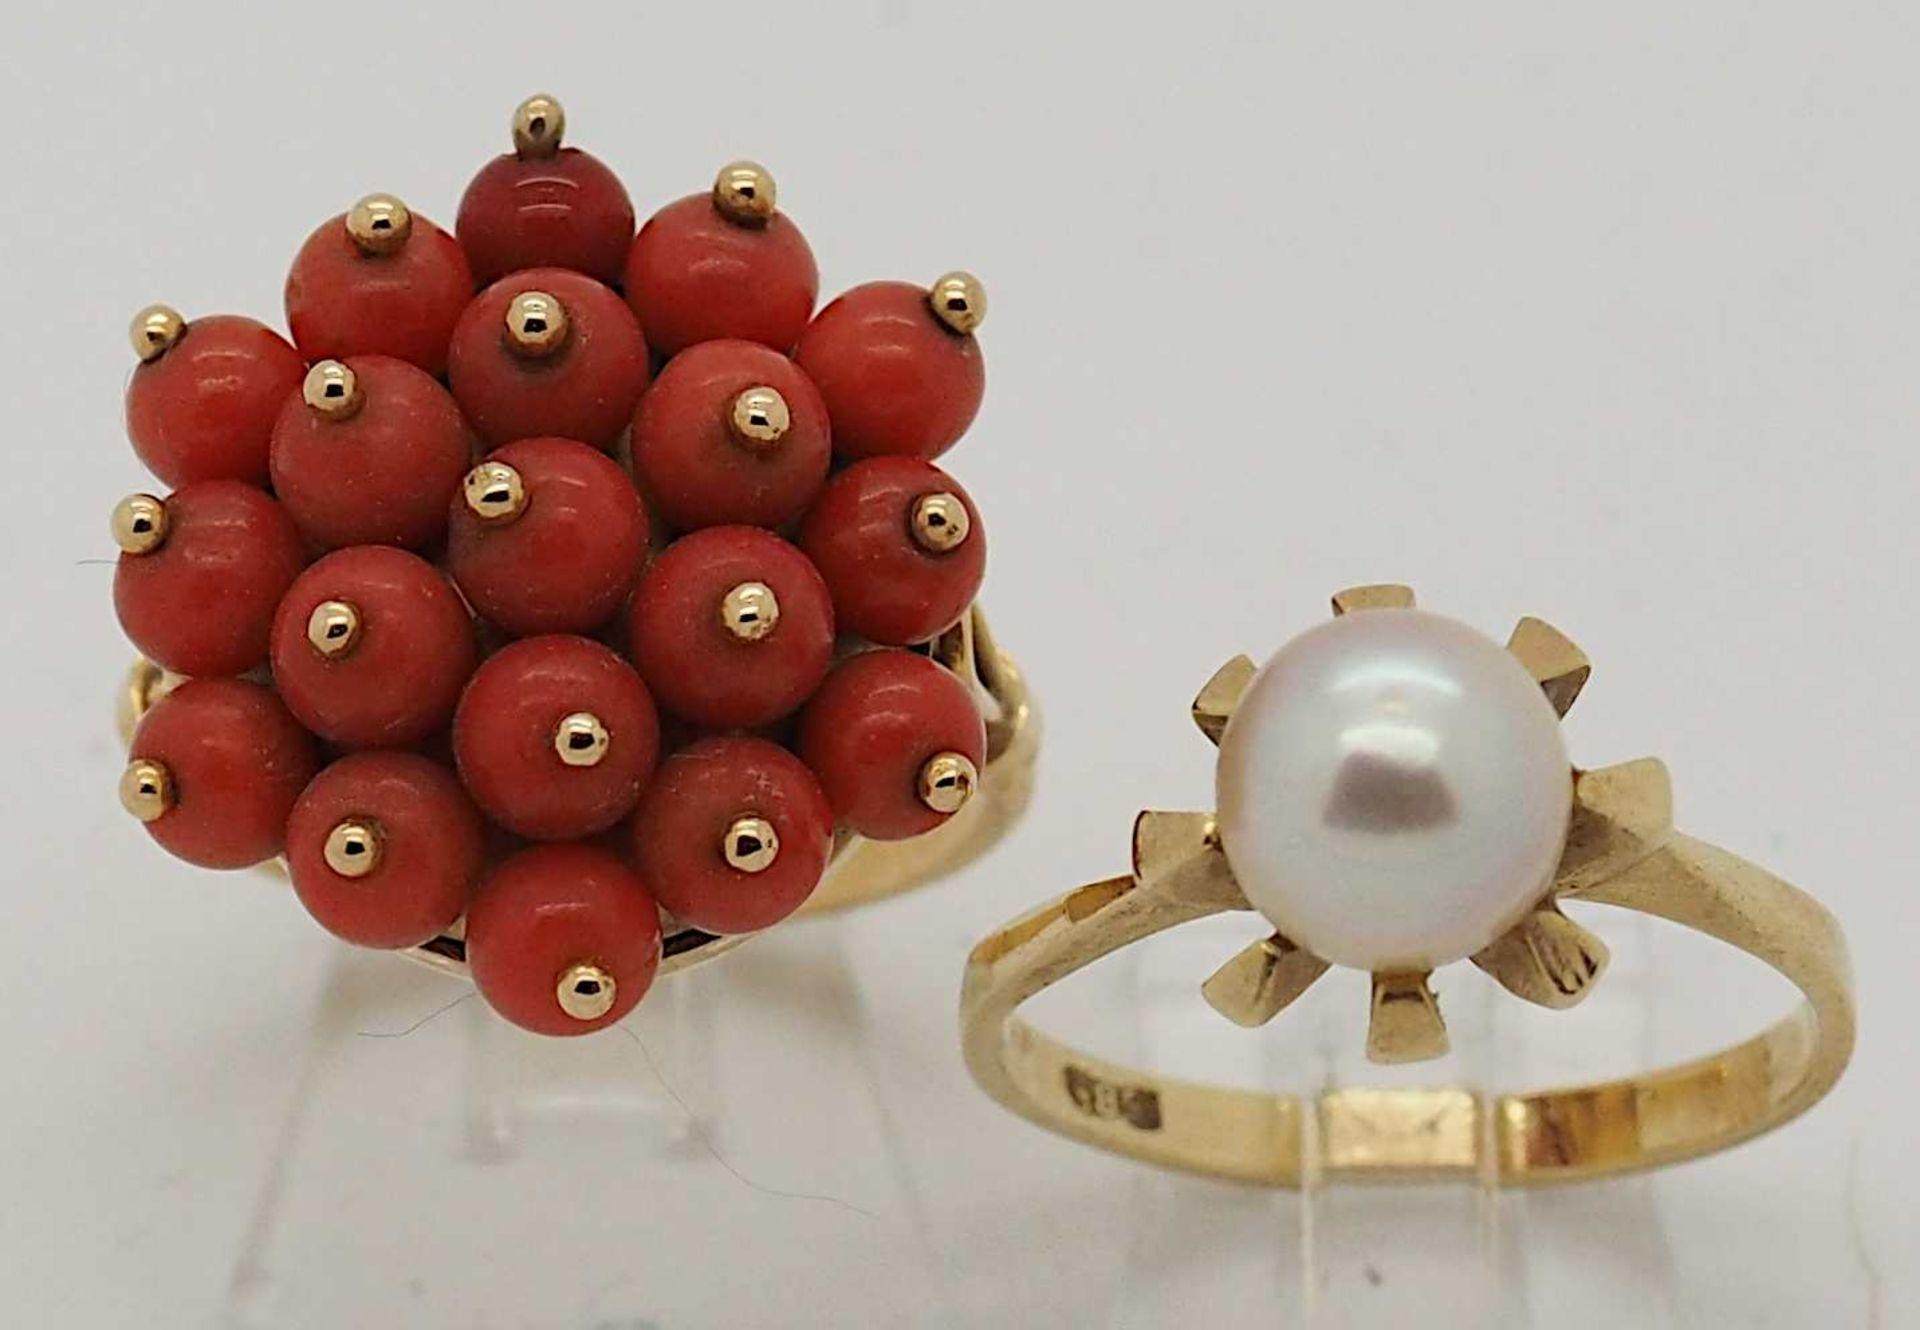 1 Damenring GG 18ct. Korallen, ca. Ringgröße 56, 1 Damenring GG 14ct. Perle, ca. Rin